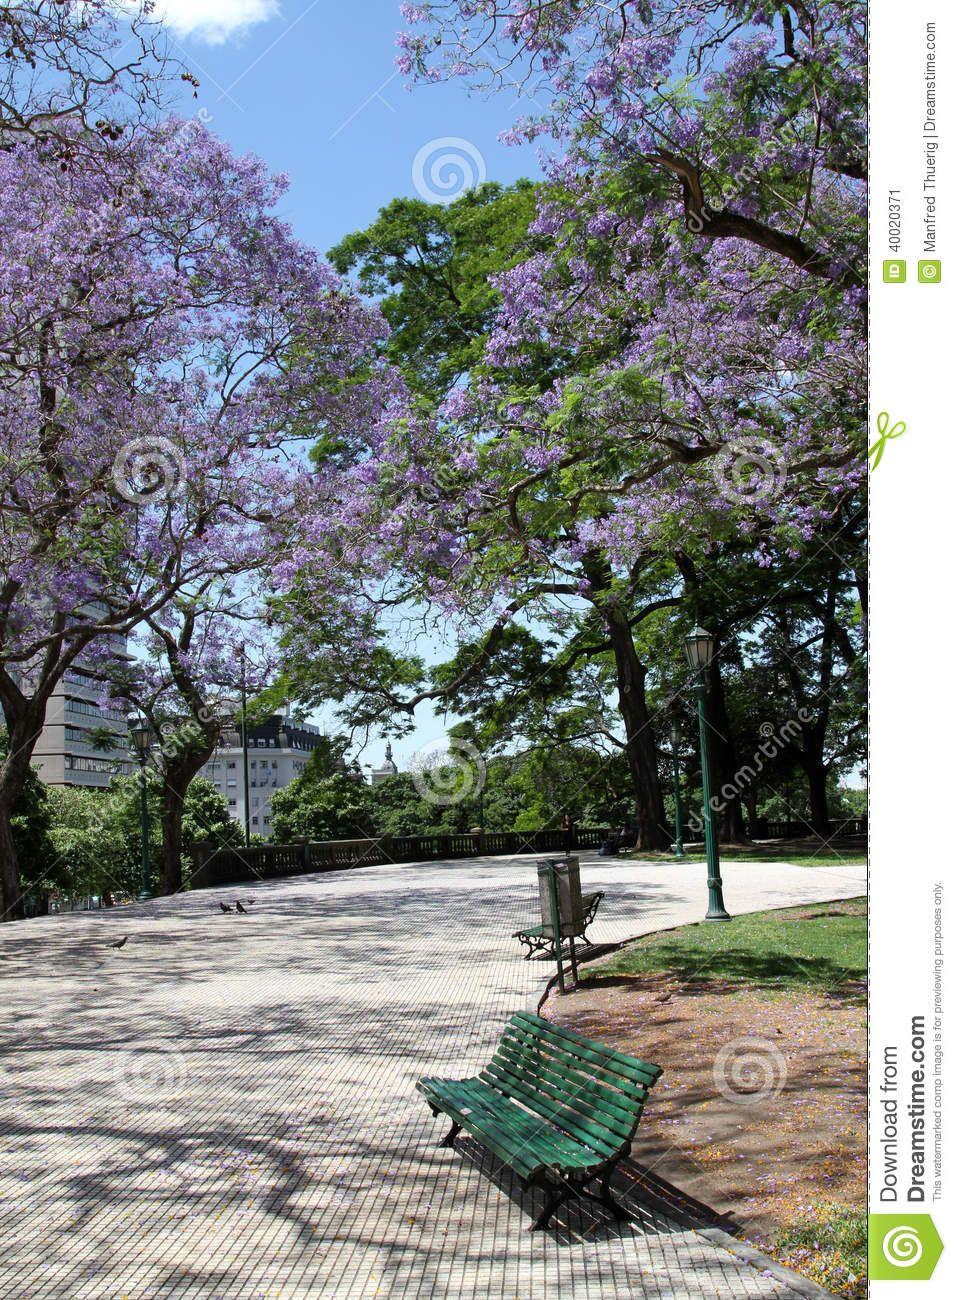 blooming jacaranda trees, Buenos Aires, Argentina